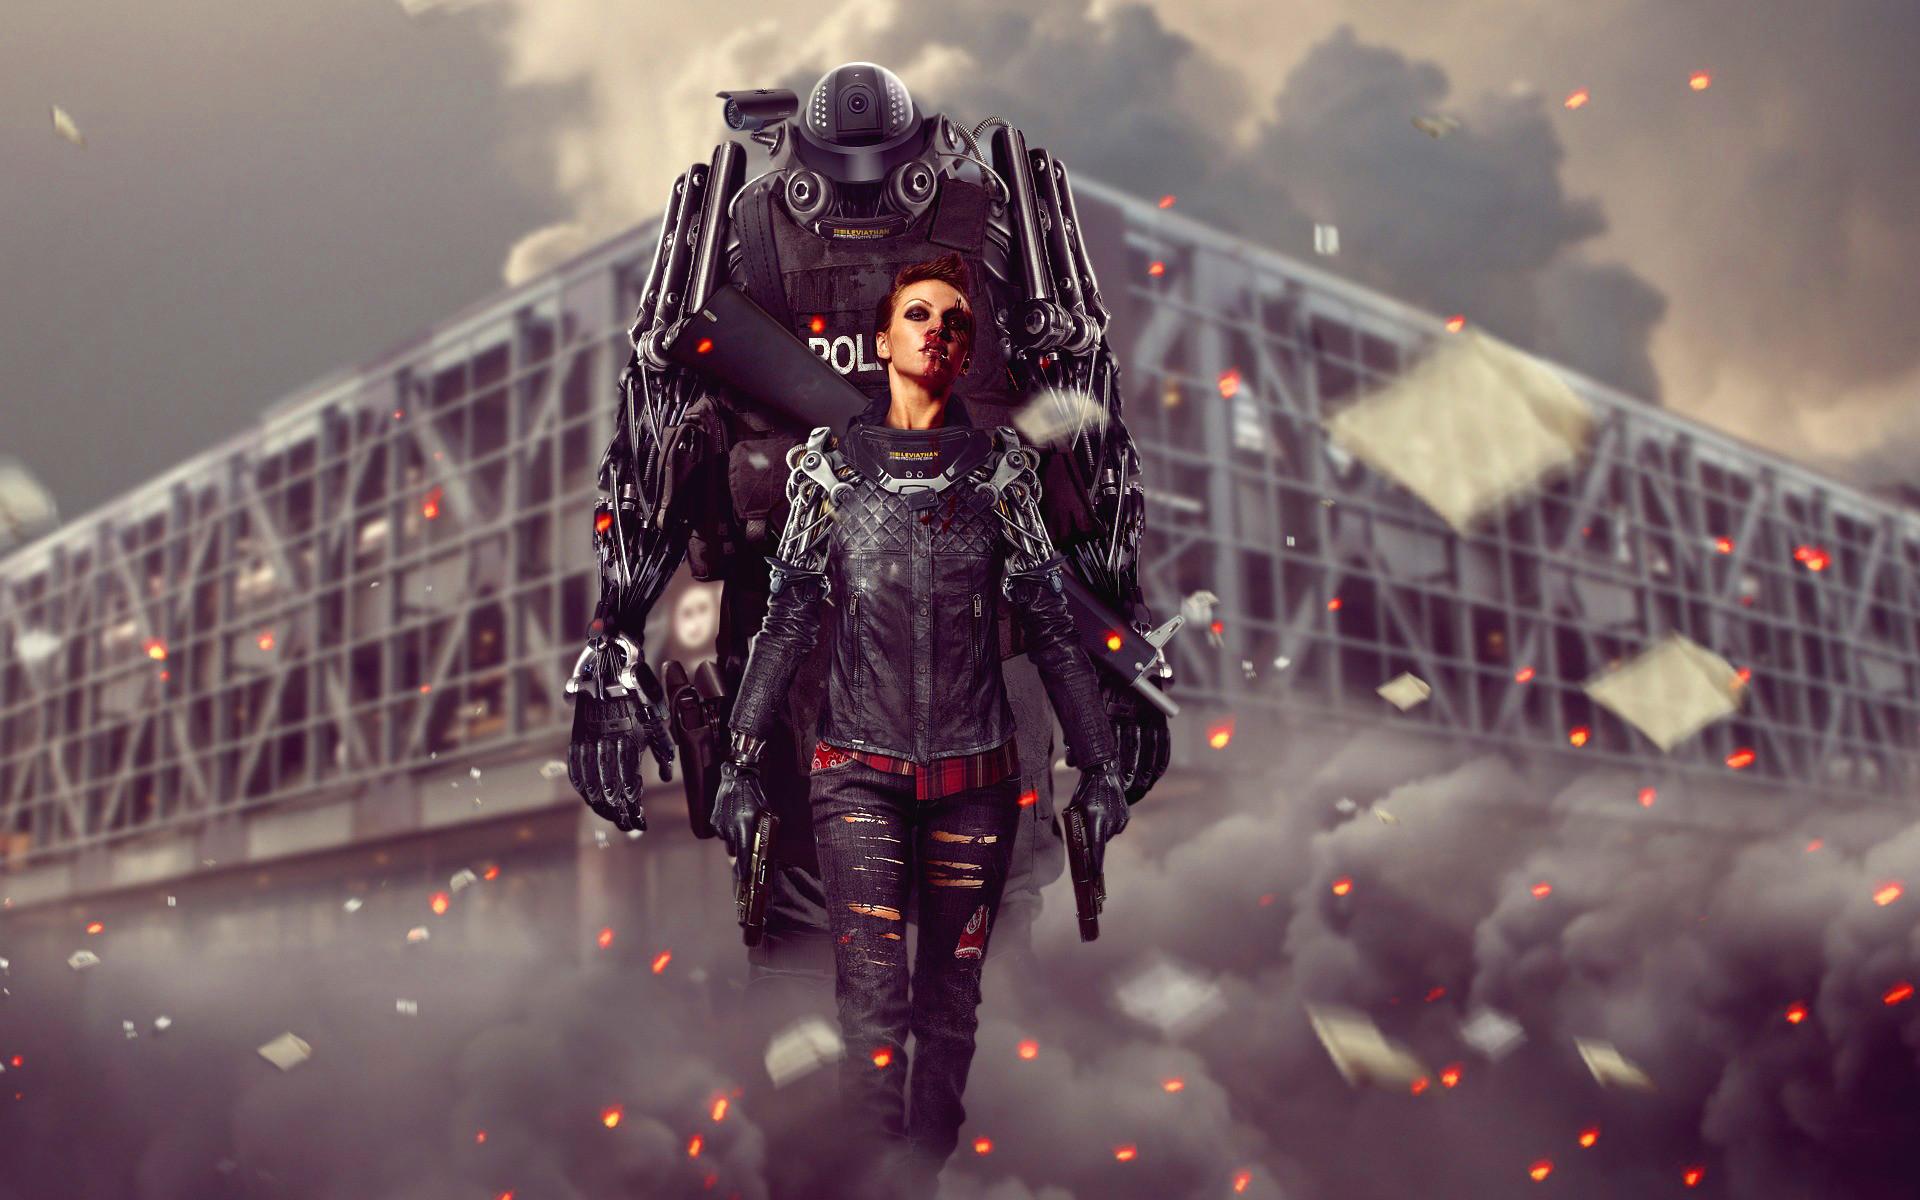 Cyborg police